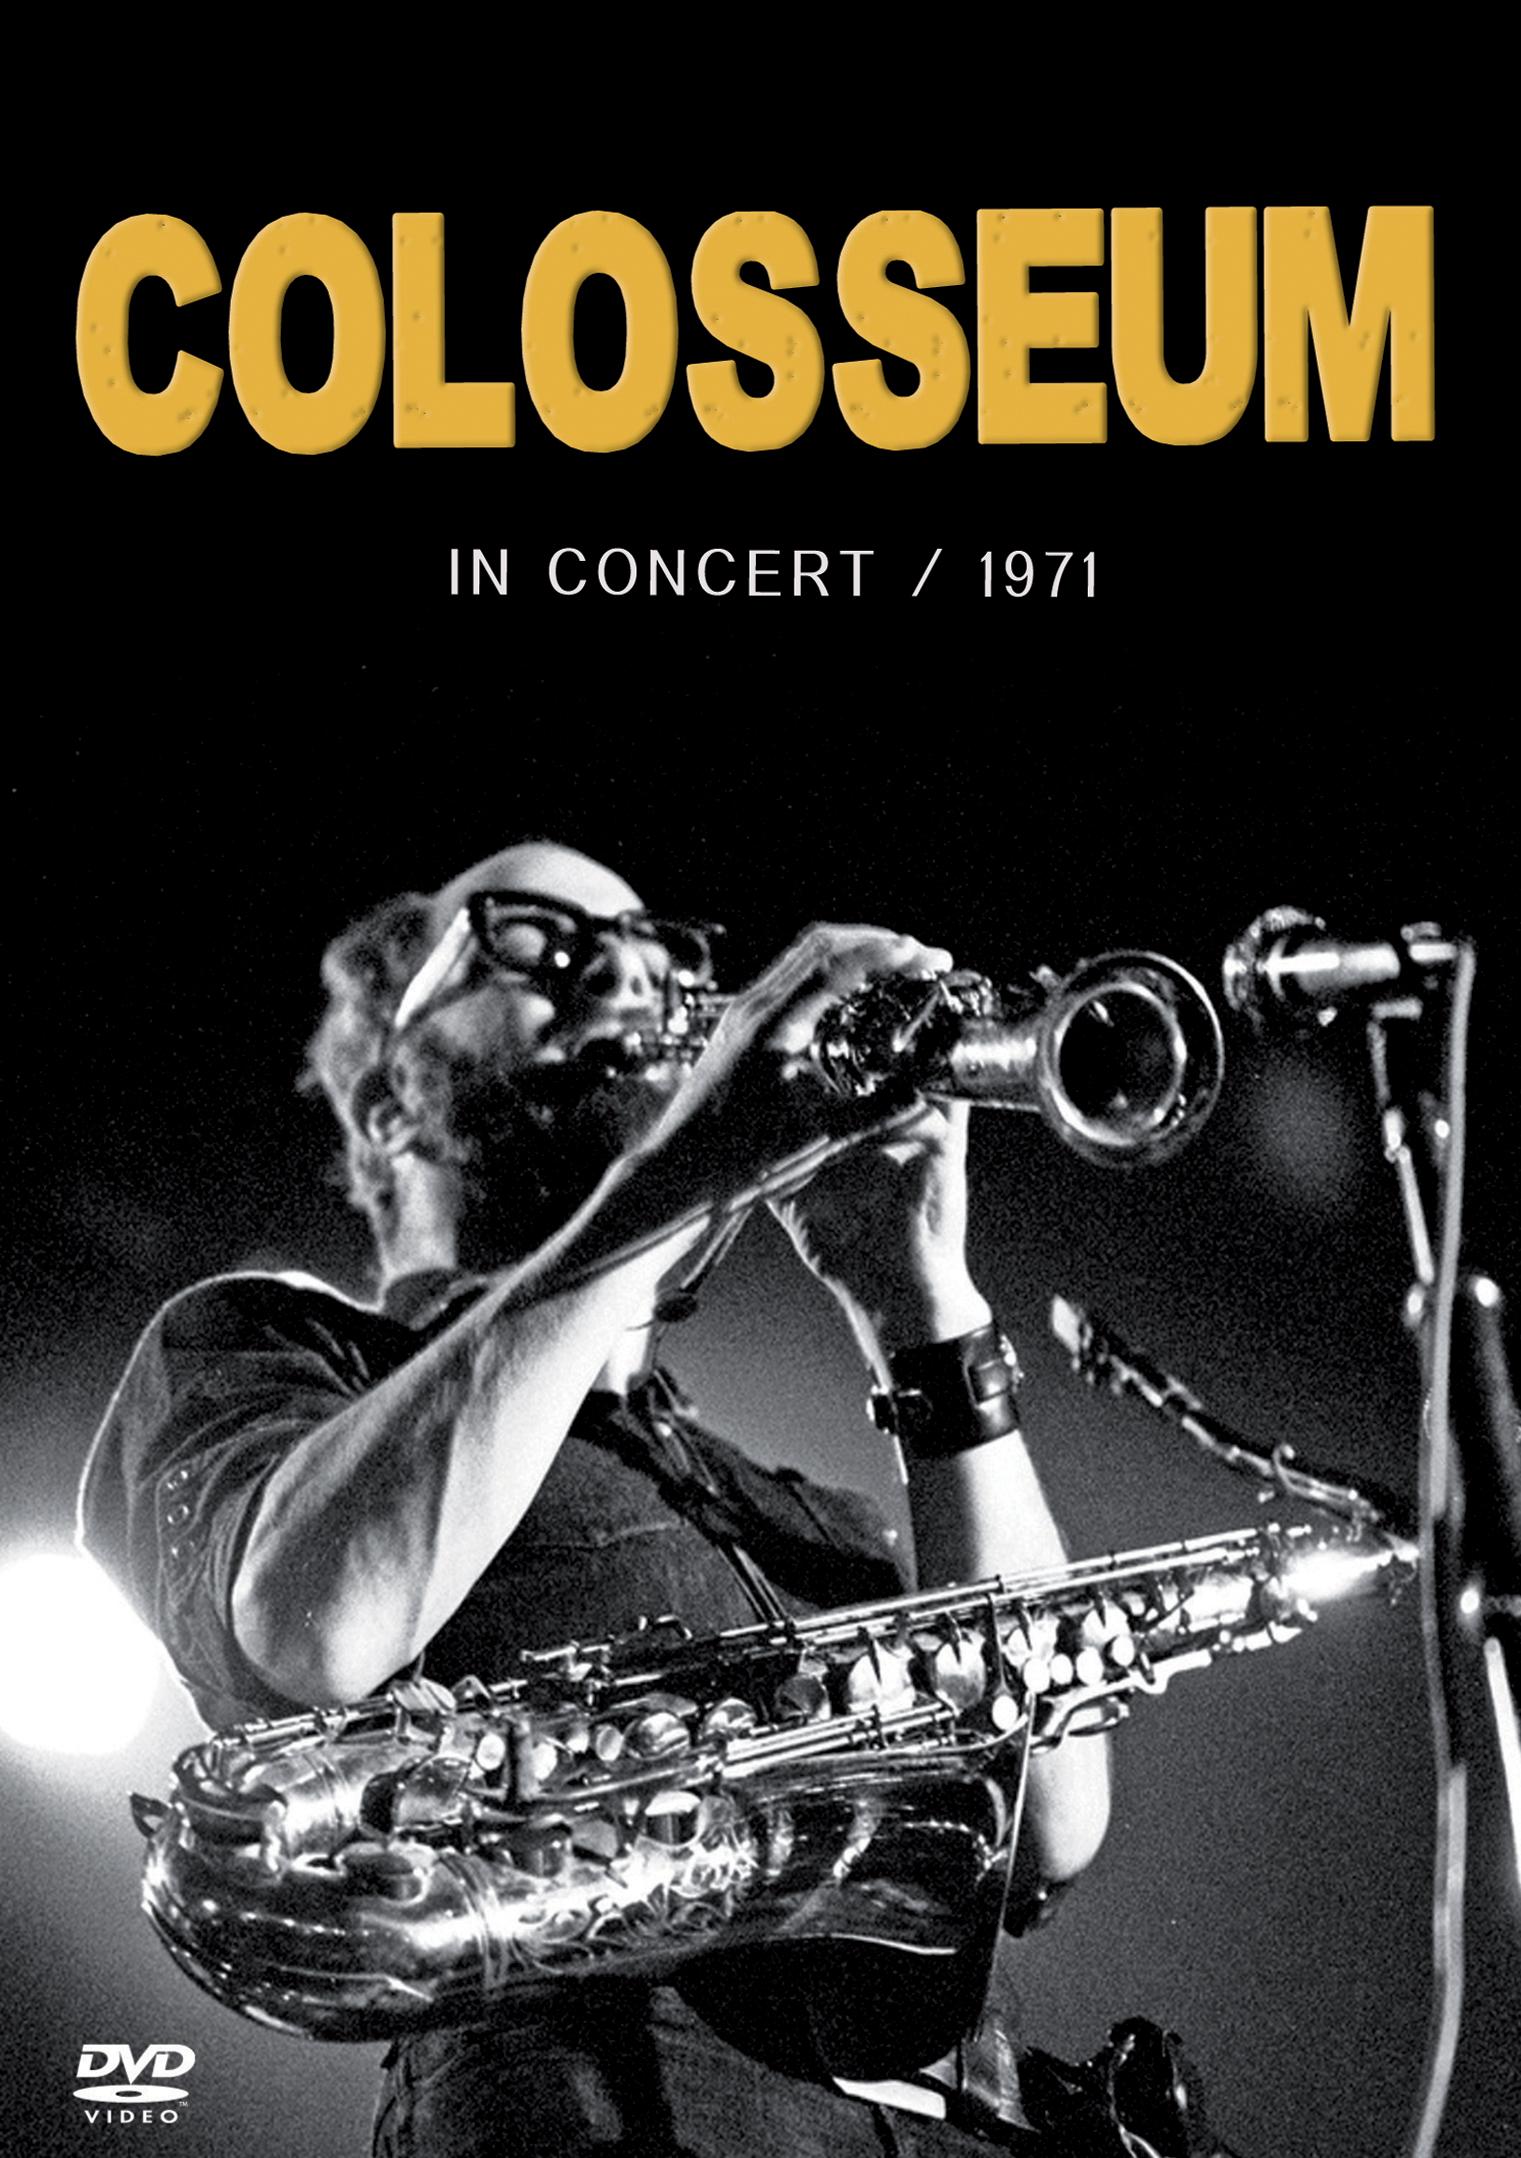 Colosseum: In Concert 1971